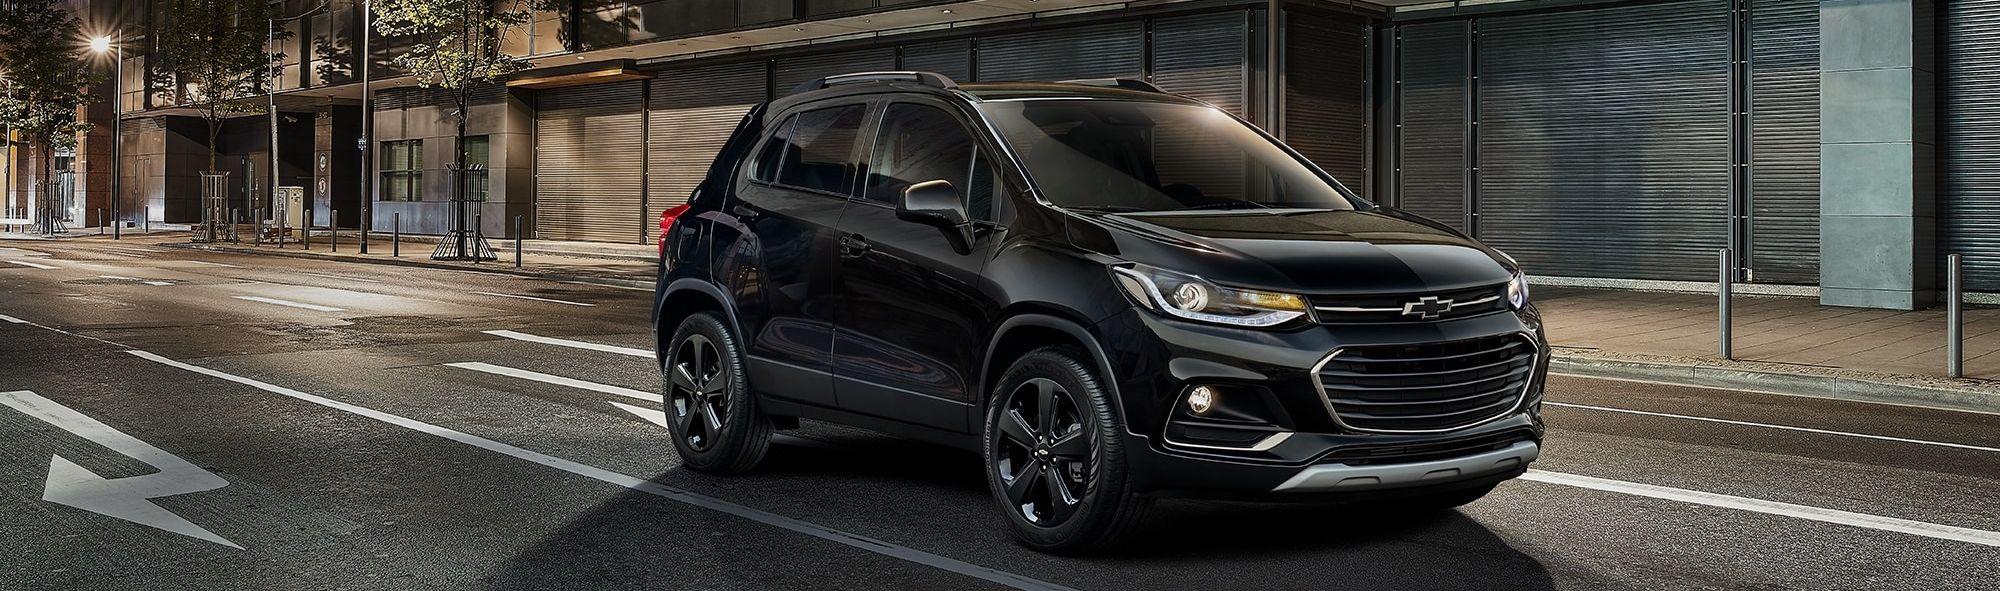 2019 Chevrolet Trax for Sale near Homer Glen, IL